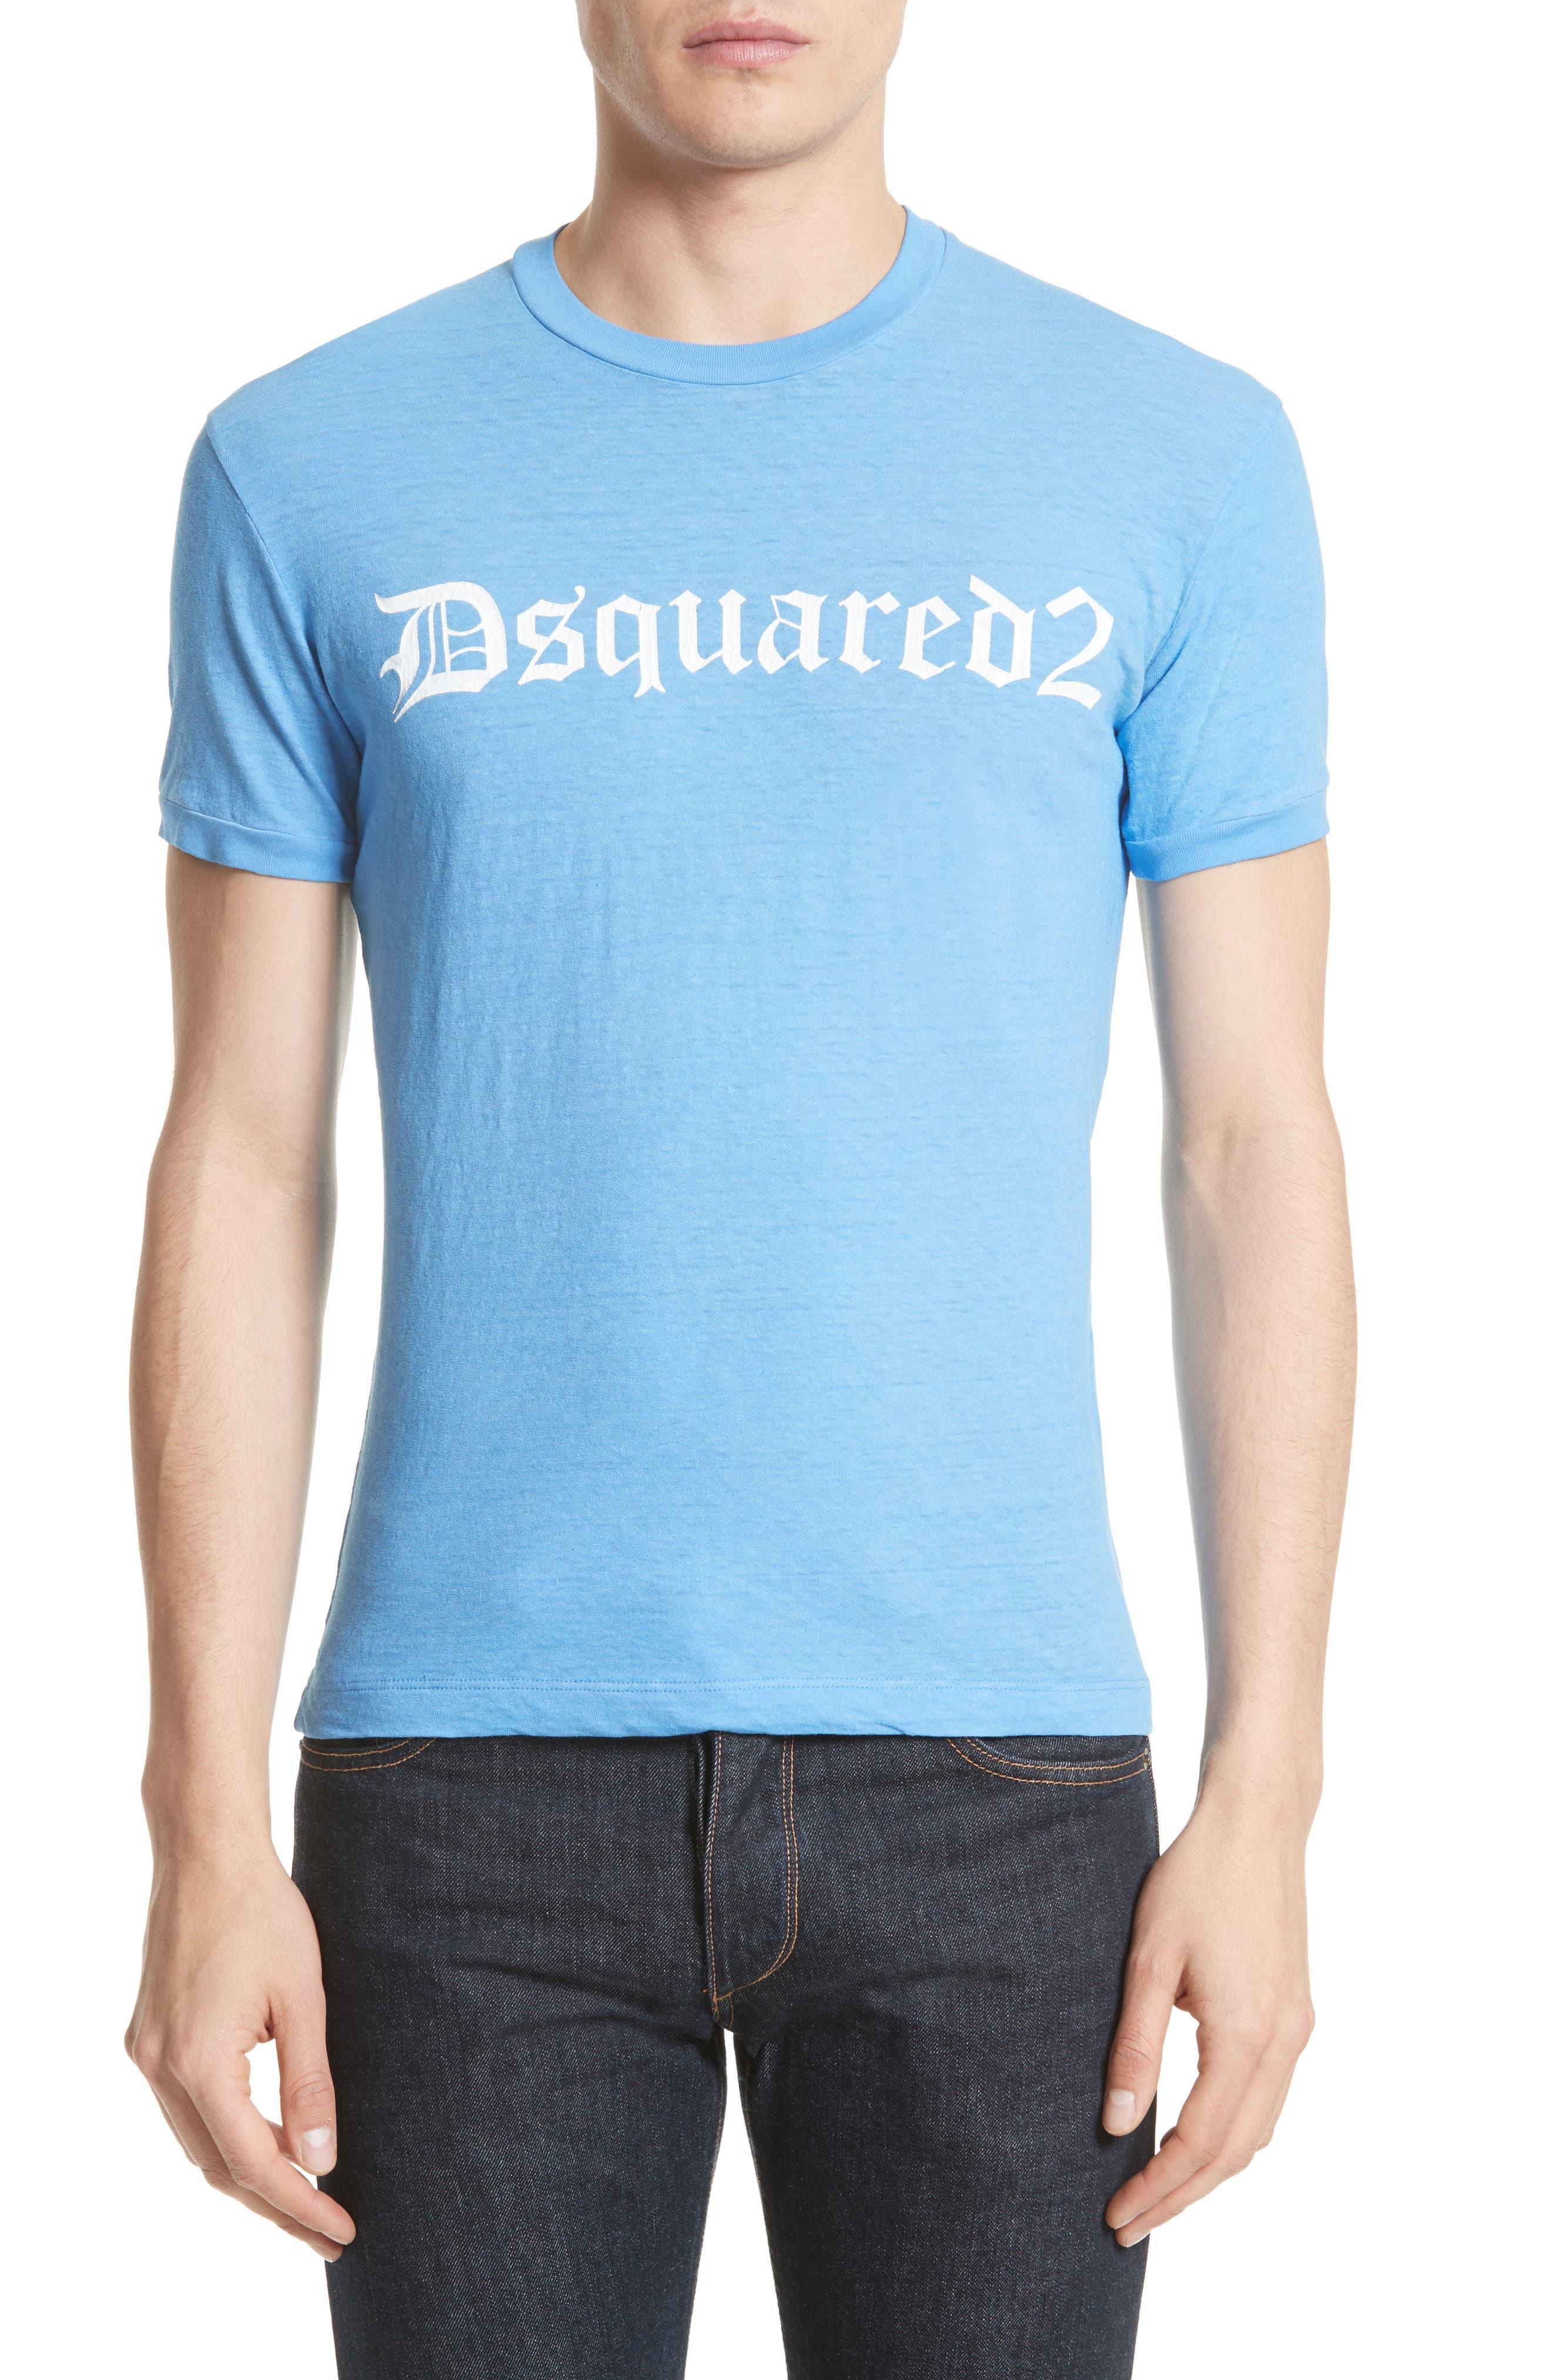 Dquared2 Cotton T-Shirt,                             Main thumbnail 1, color,                             449